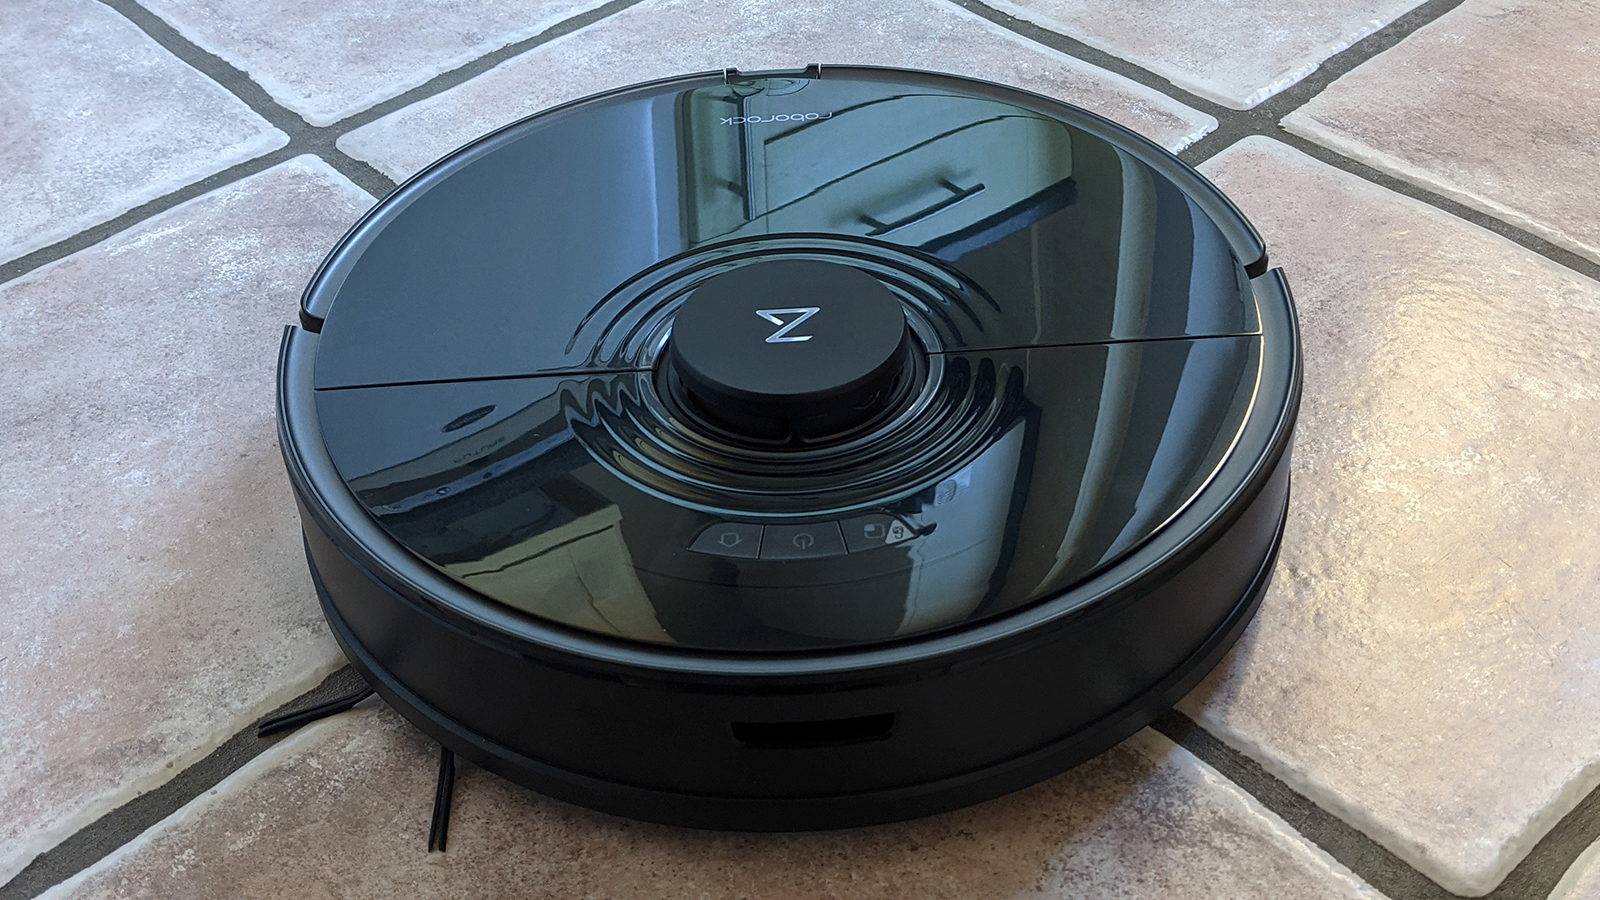 Roborock S7 vacuum review